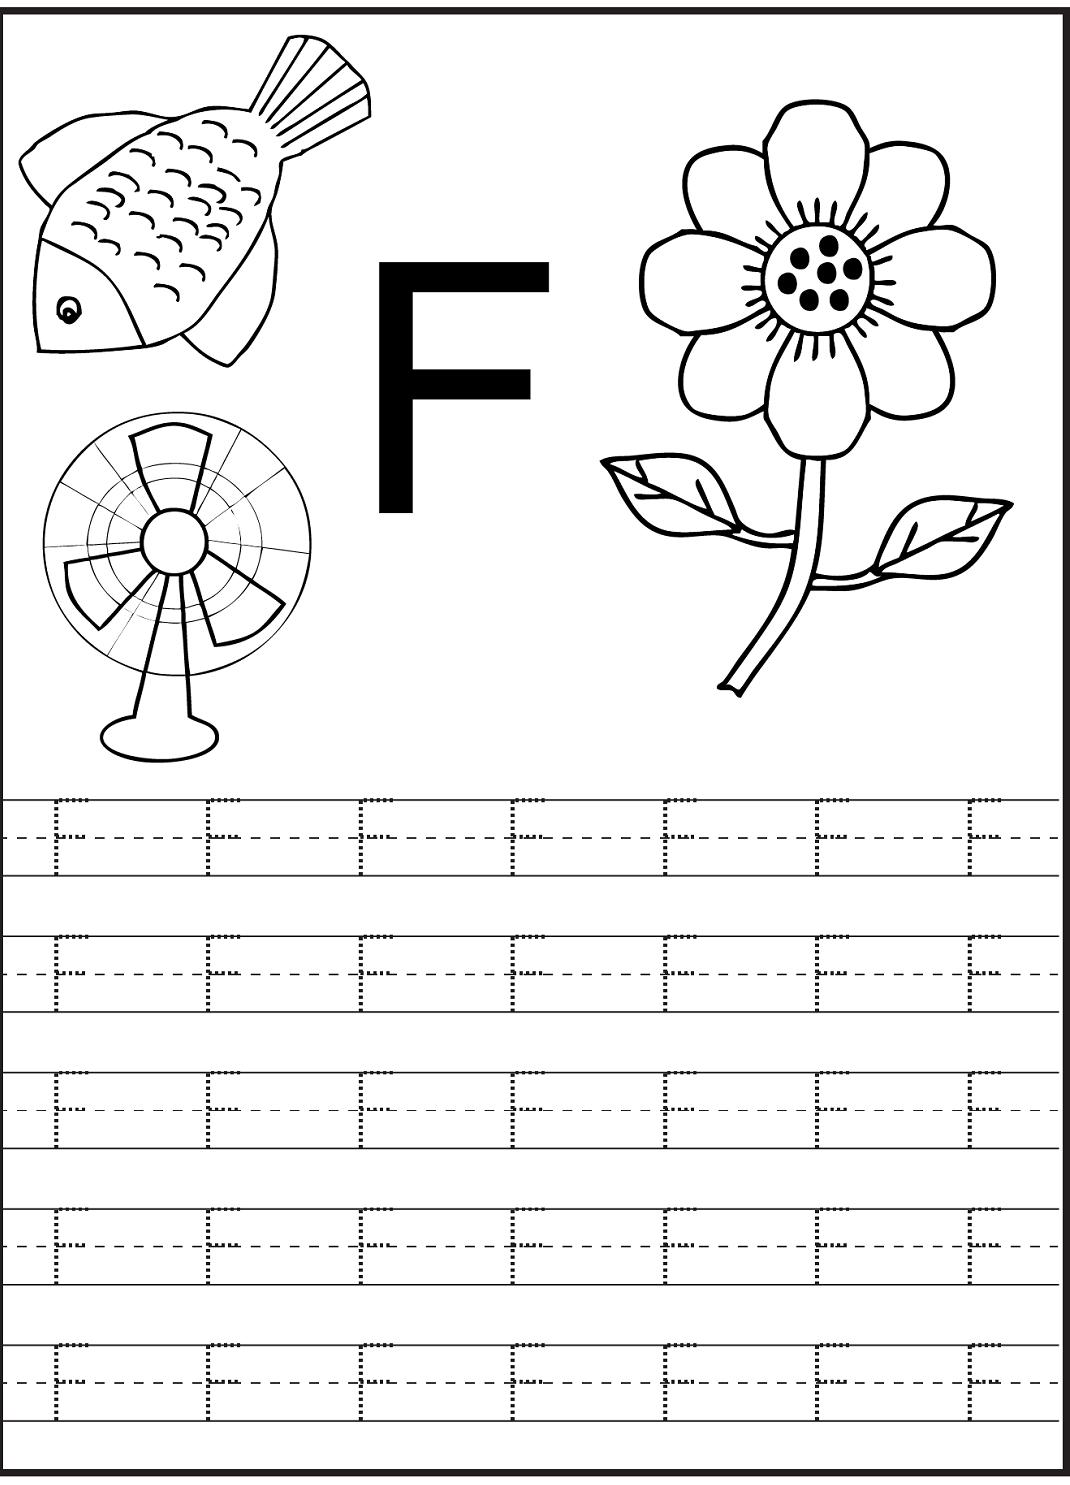 Letter F Worksheet For Preschool And Kindergarten | Alphabet